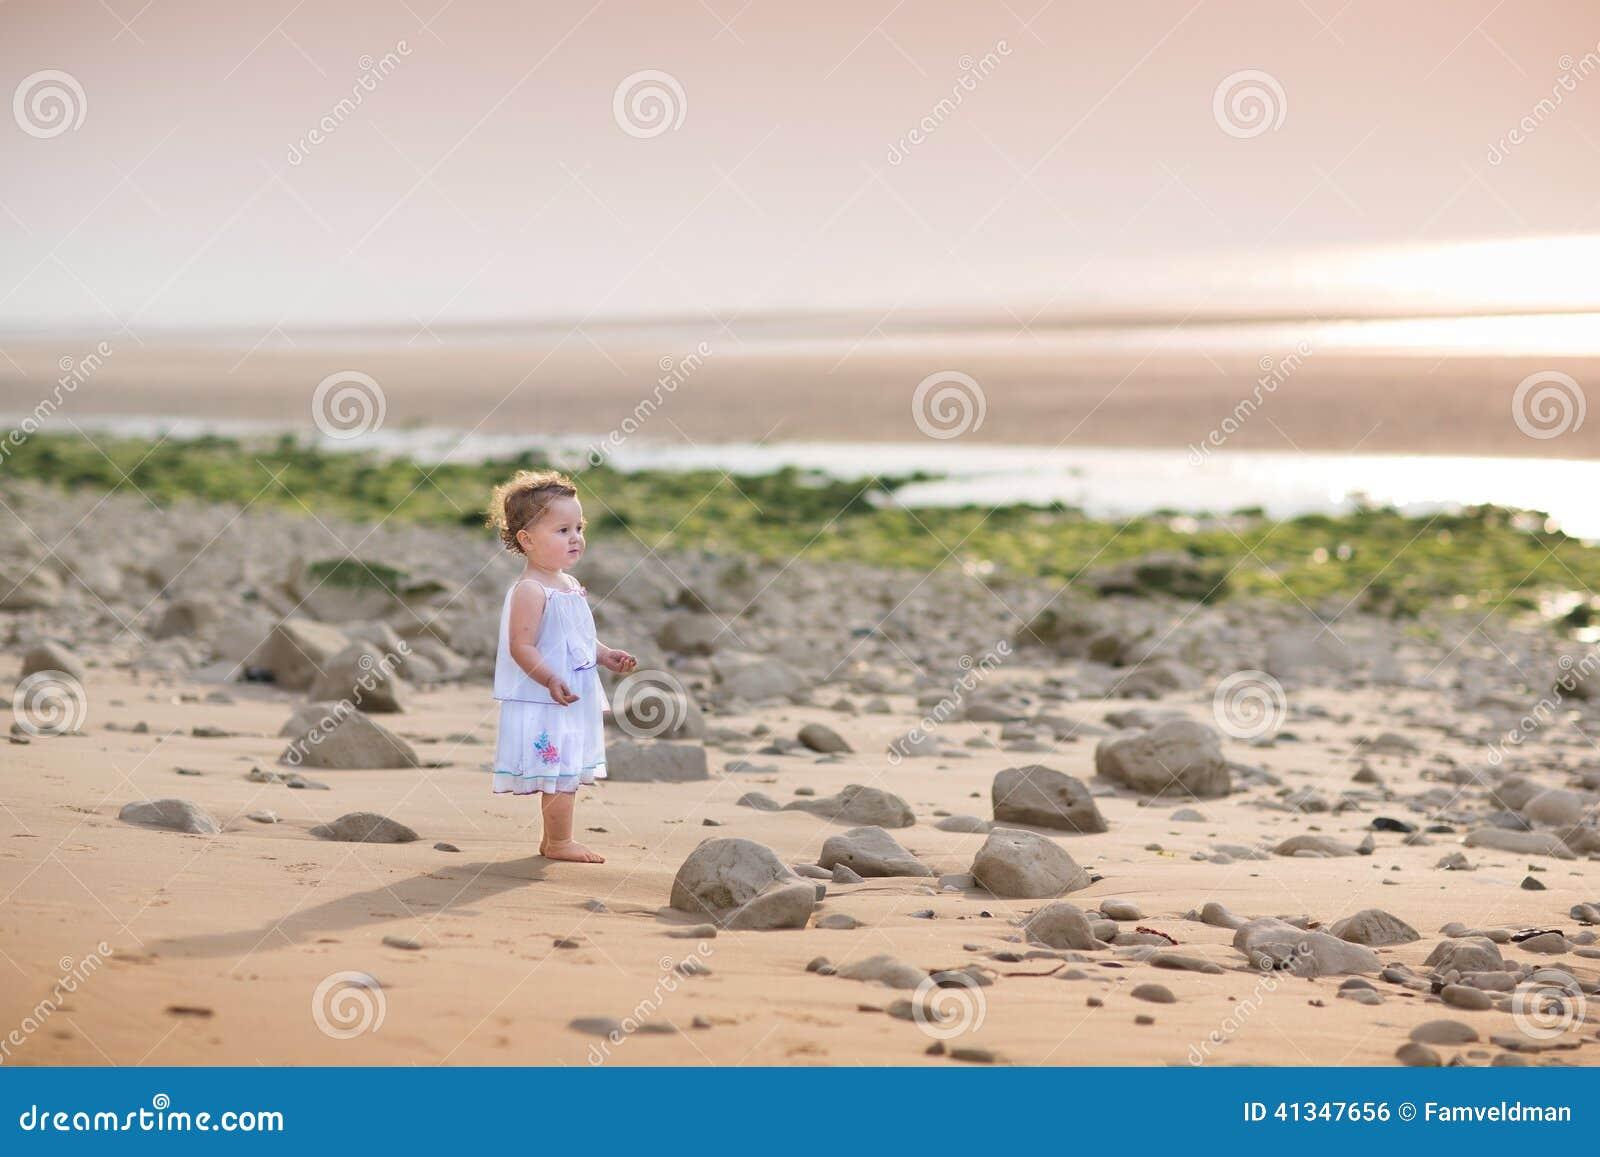 beautiful beach watching the - photo #5